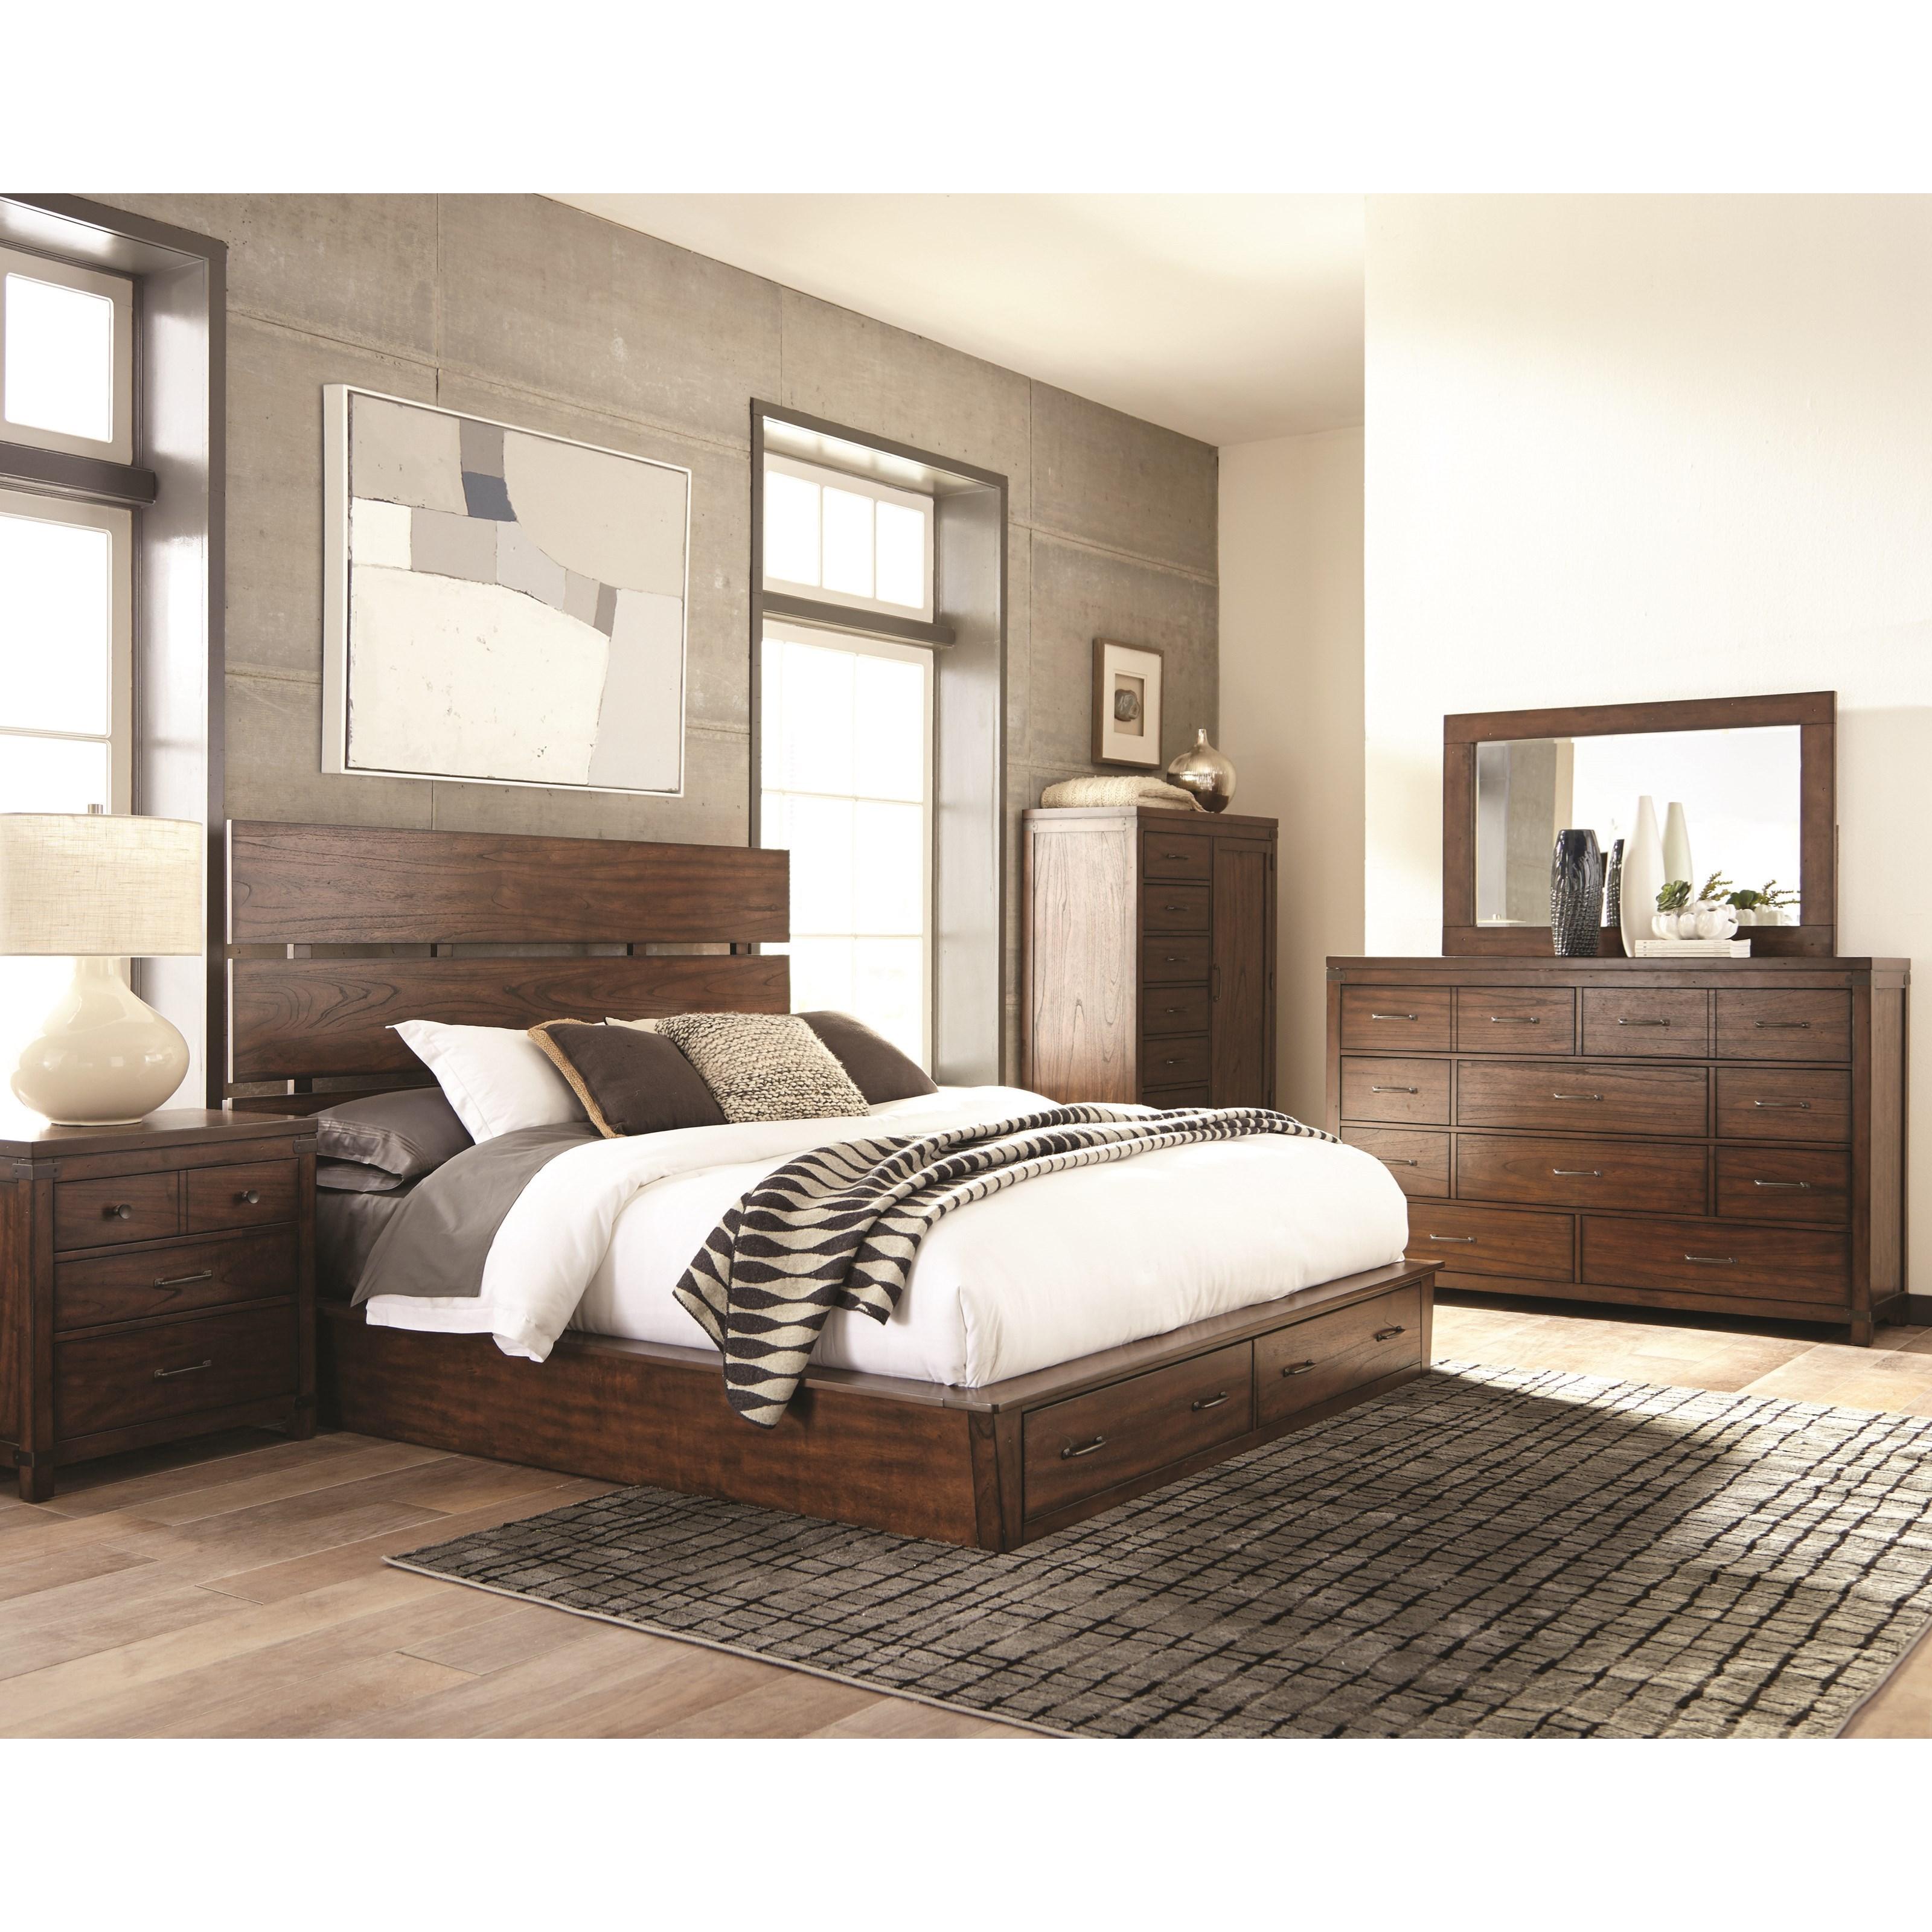 Cal. King Storage Bedroom Group